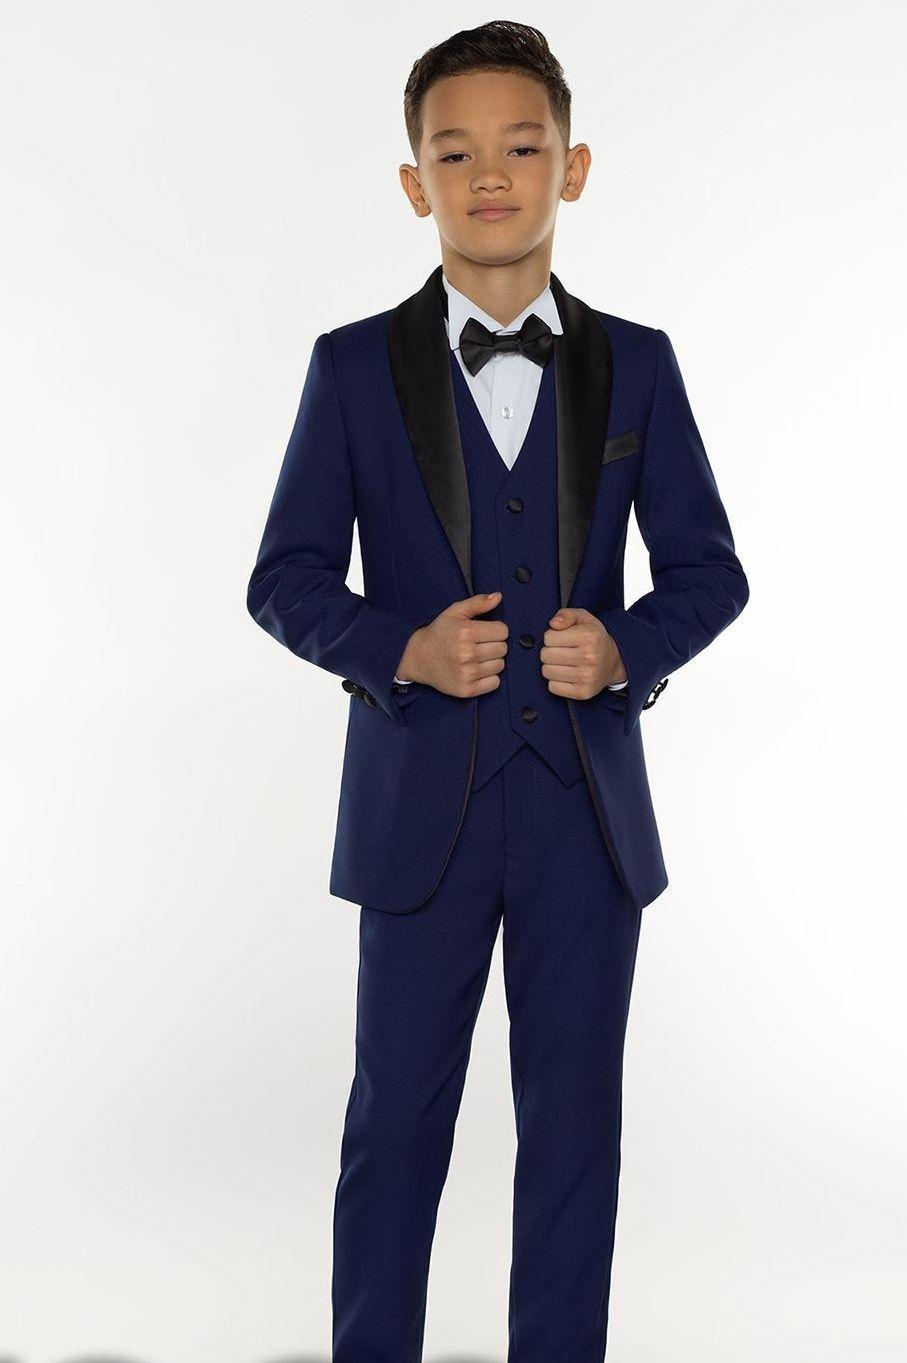 Boys Tuxedo Boys Dinner Suits Boys Formal Suits Tuxedo for Kids Tuxedo Formal Occasion White And Black Suits For Little Men Three Piece